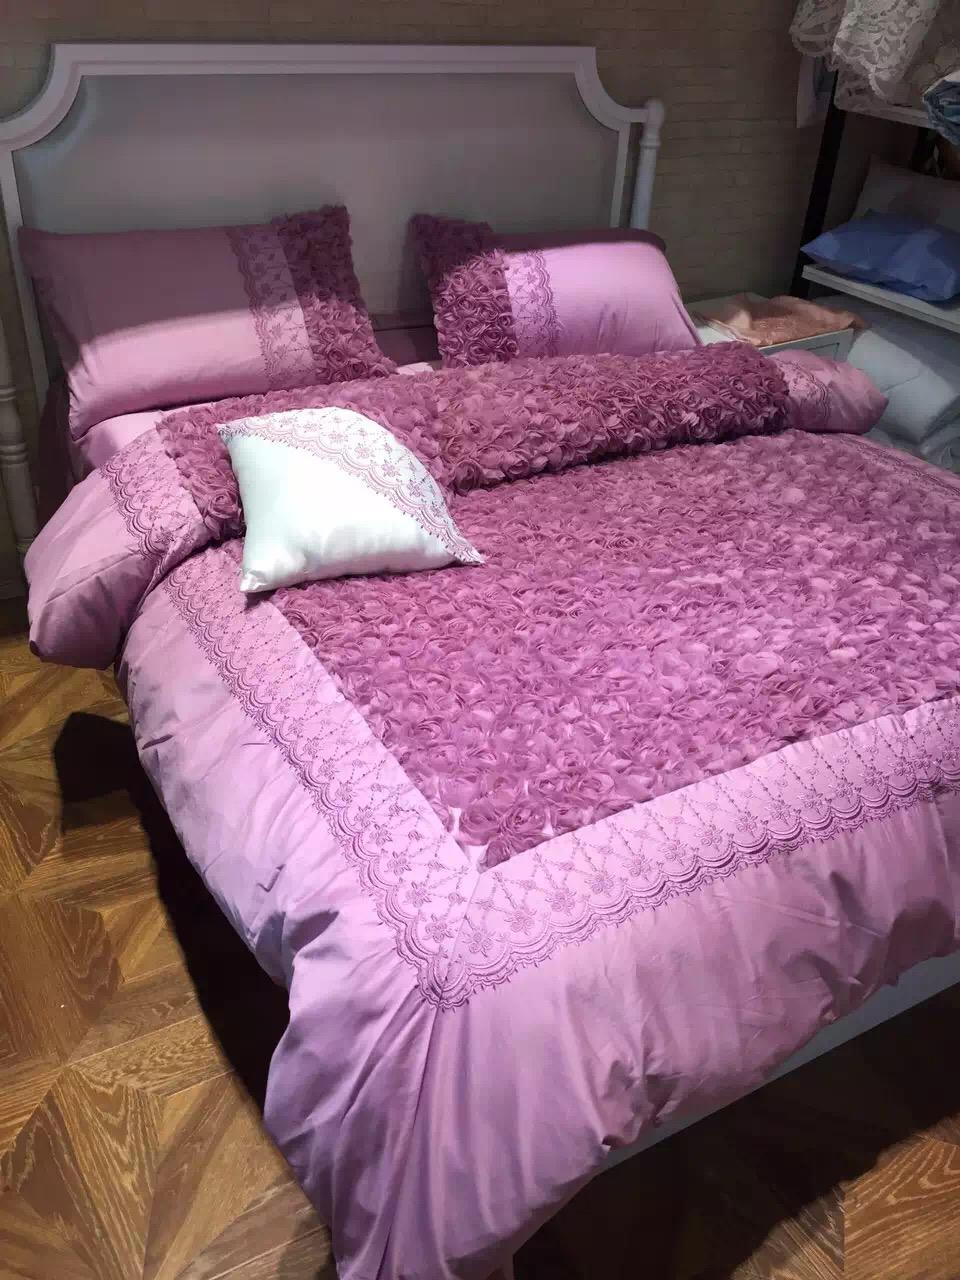 algodn romntica prpura rosas cosida bordado ropa de cama duvet cover set queen king